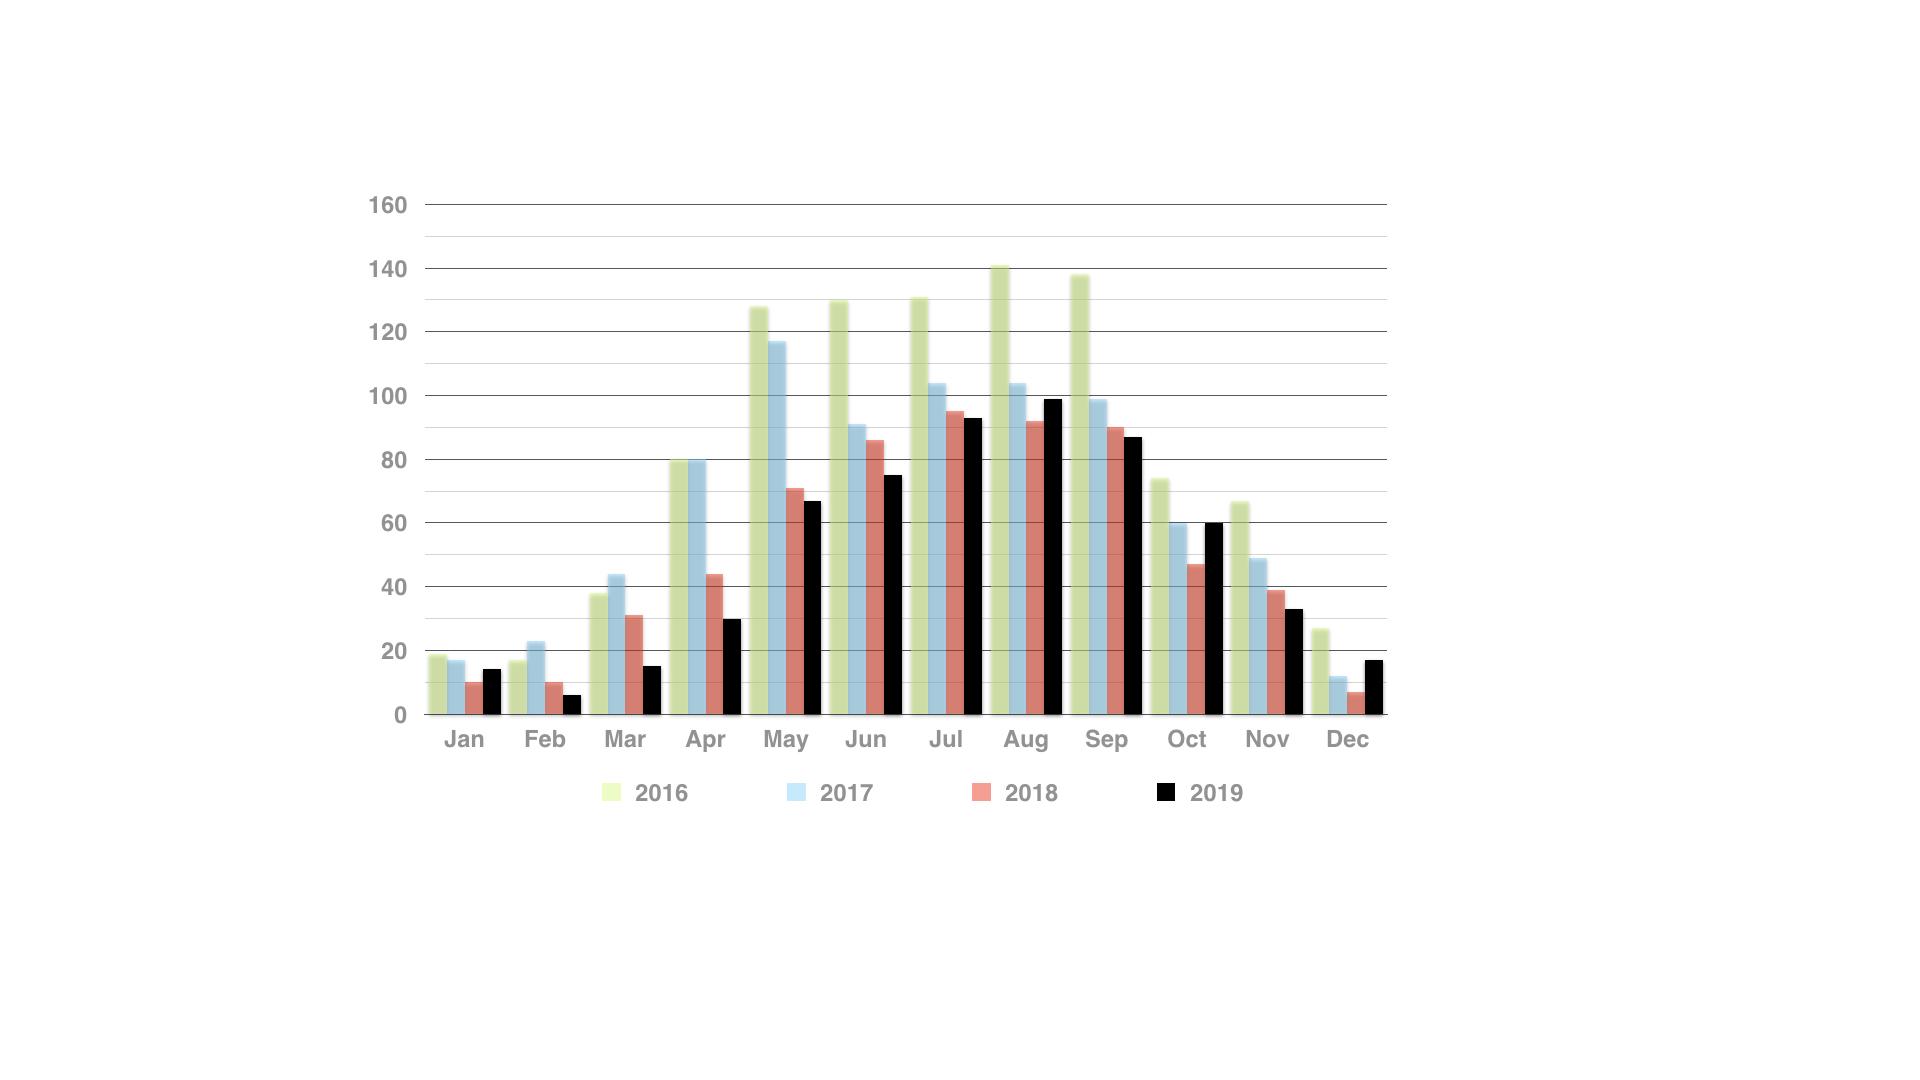 muskoka-cottage-real-estate-unit-sales-by-month.001